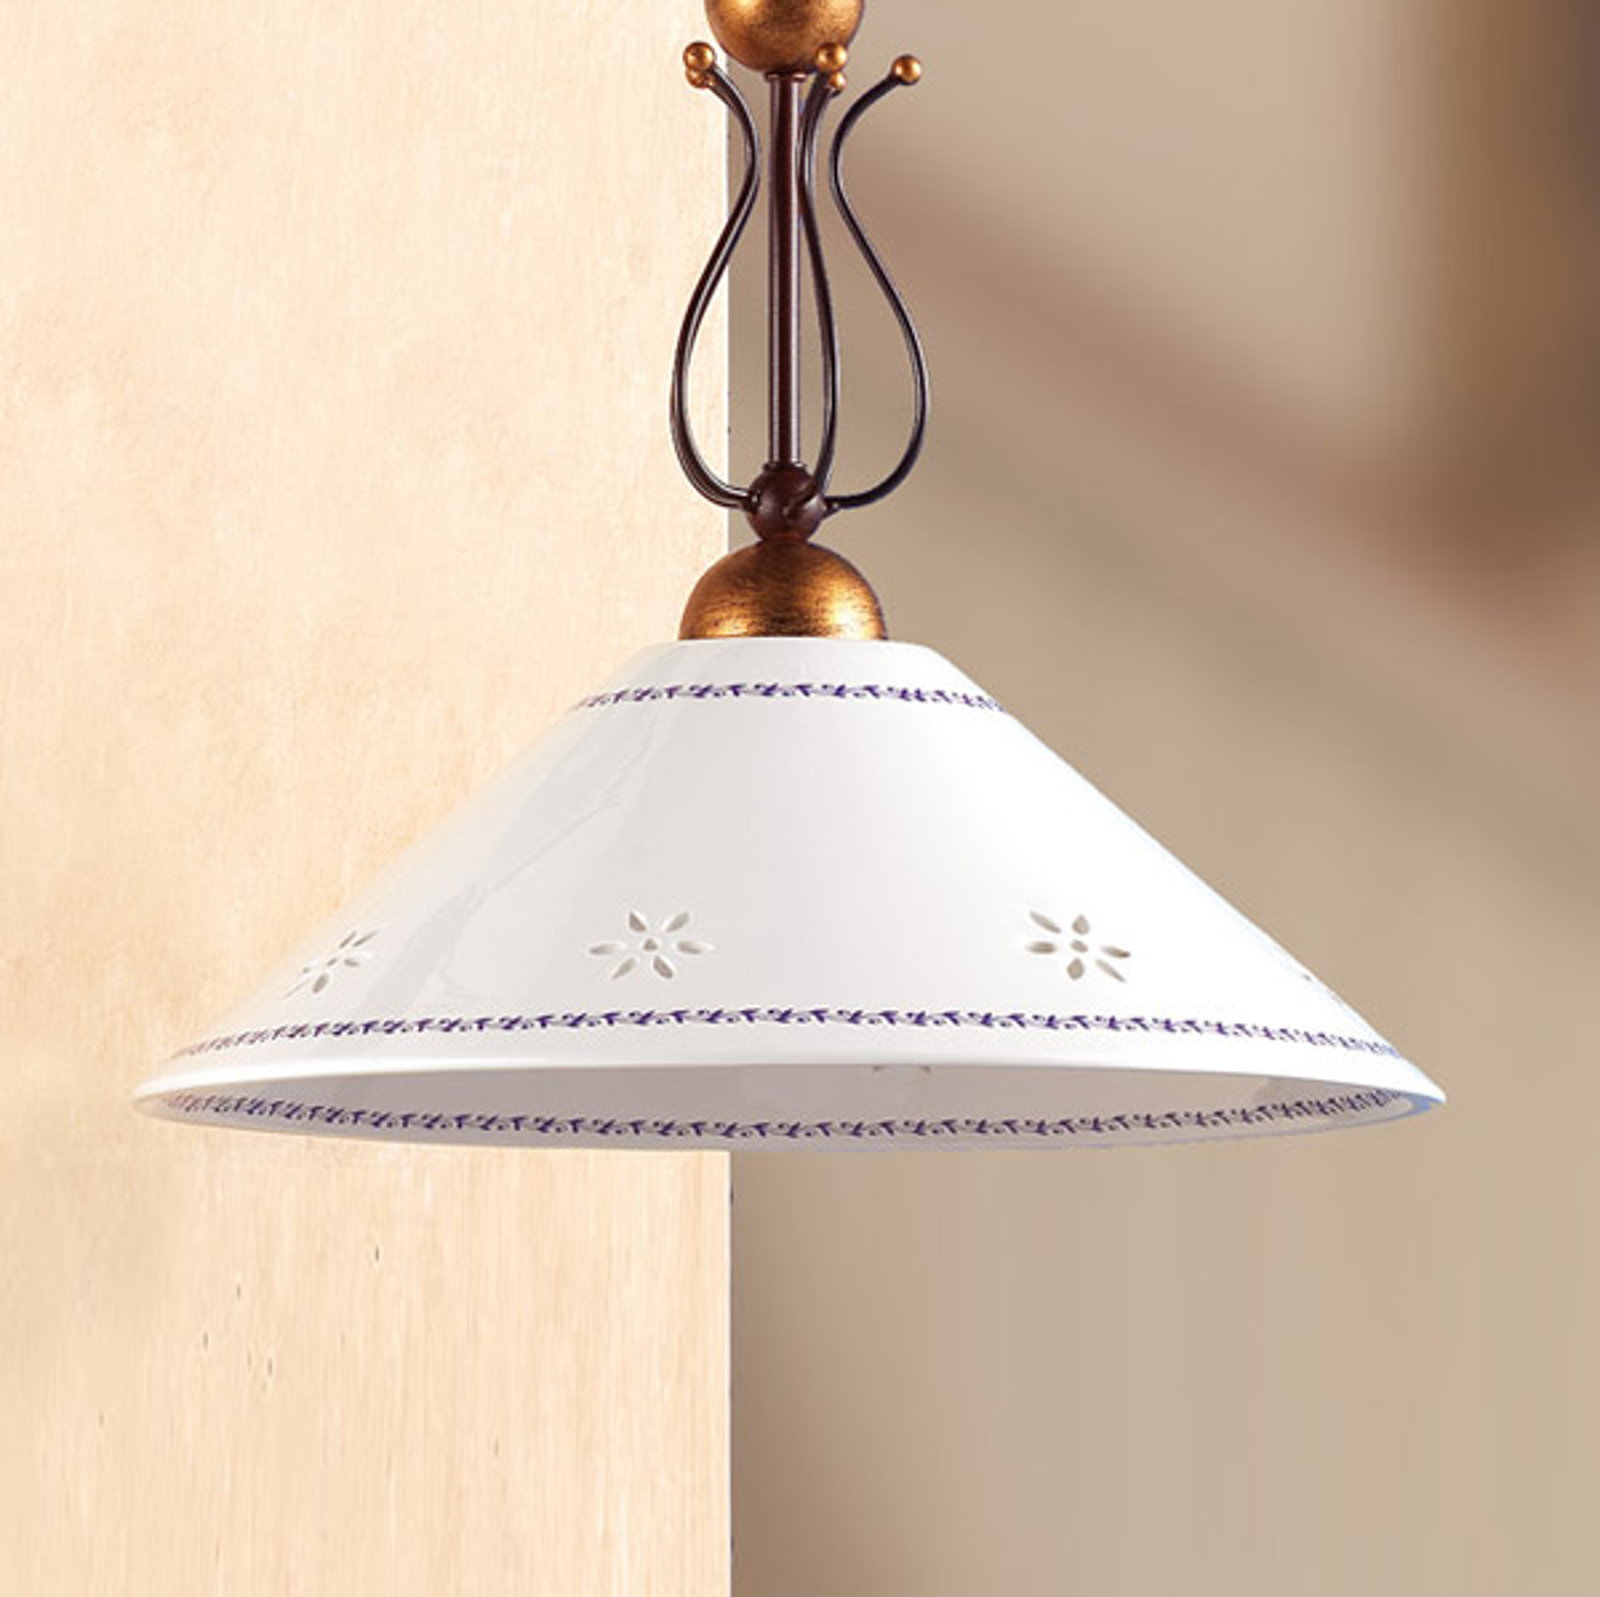 LIBERTY hanging light_2013035_1